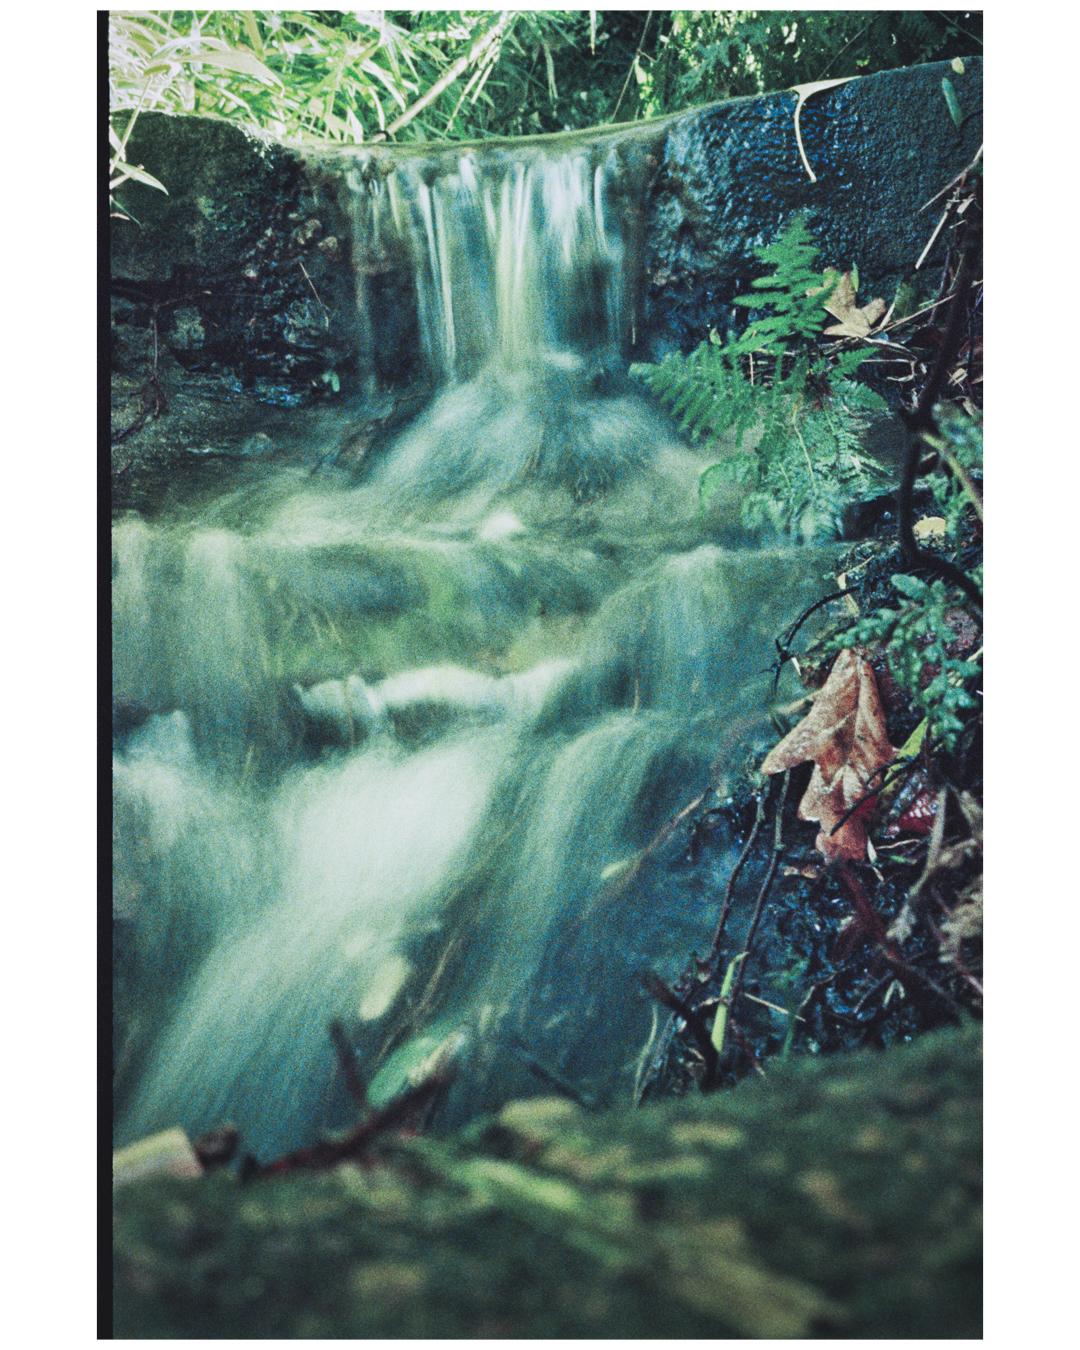 Film Photography Photo Walk 35mm - South Africa - by Ken Treloar Photography-8.jpg